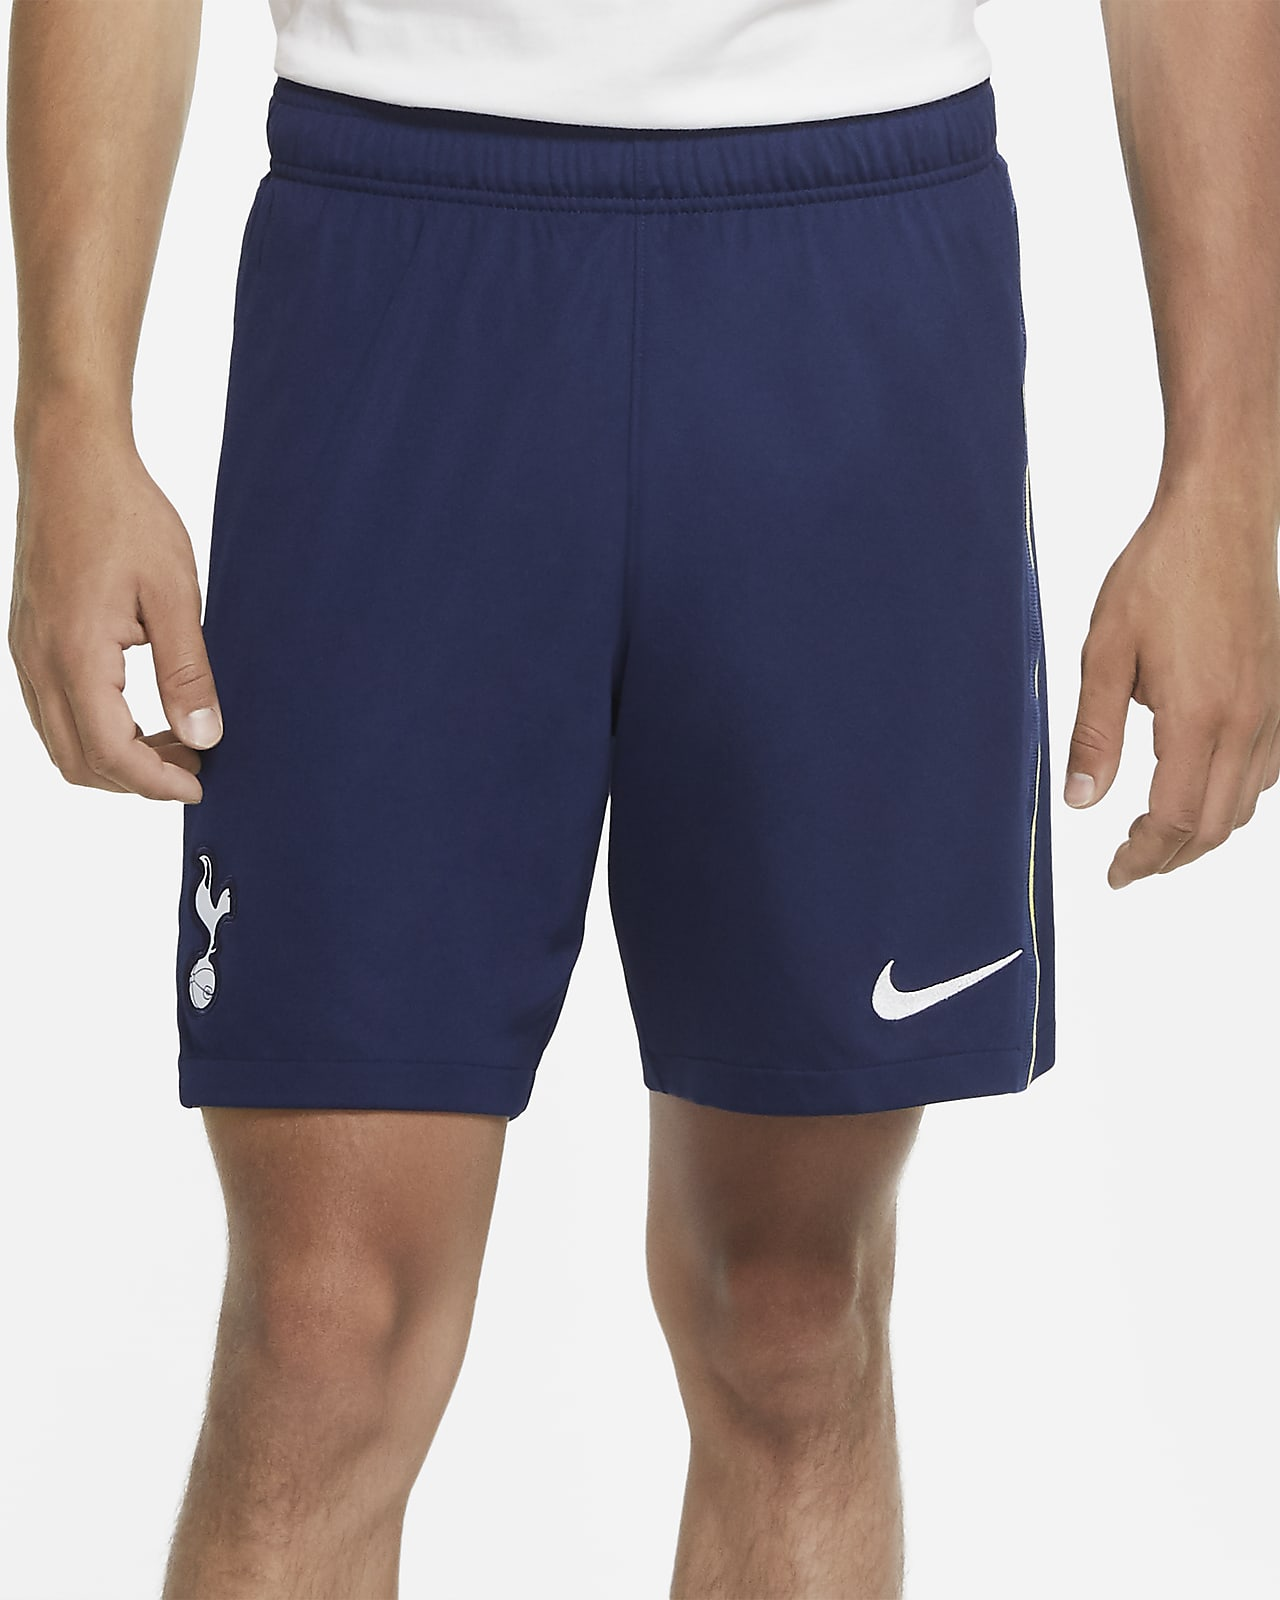 Nouveau OLDHAM ATHLETIC 2020 Homme Adulte Football Shorts Small Medium Large Extra